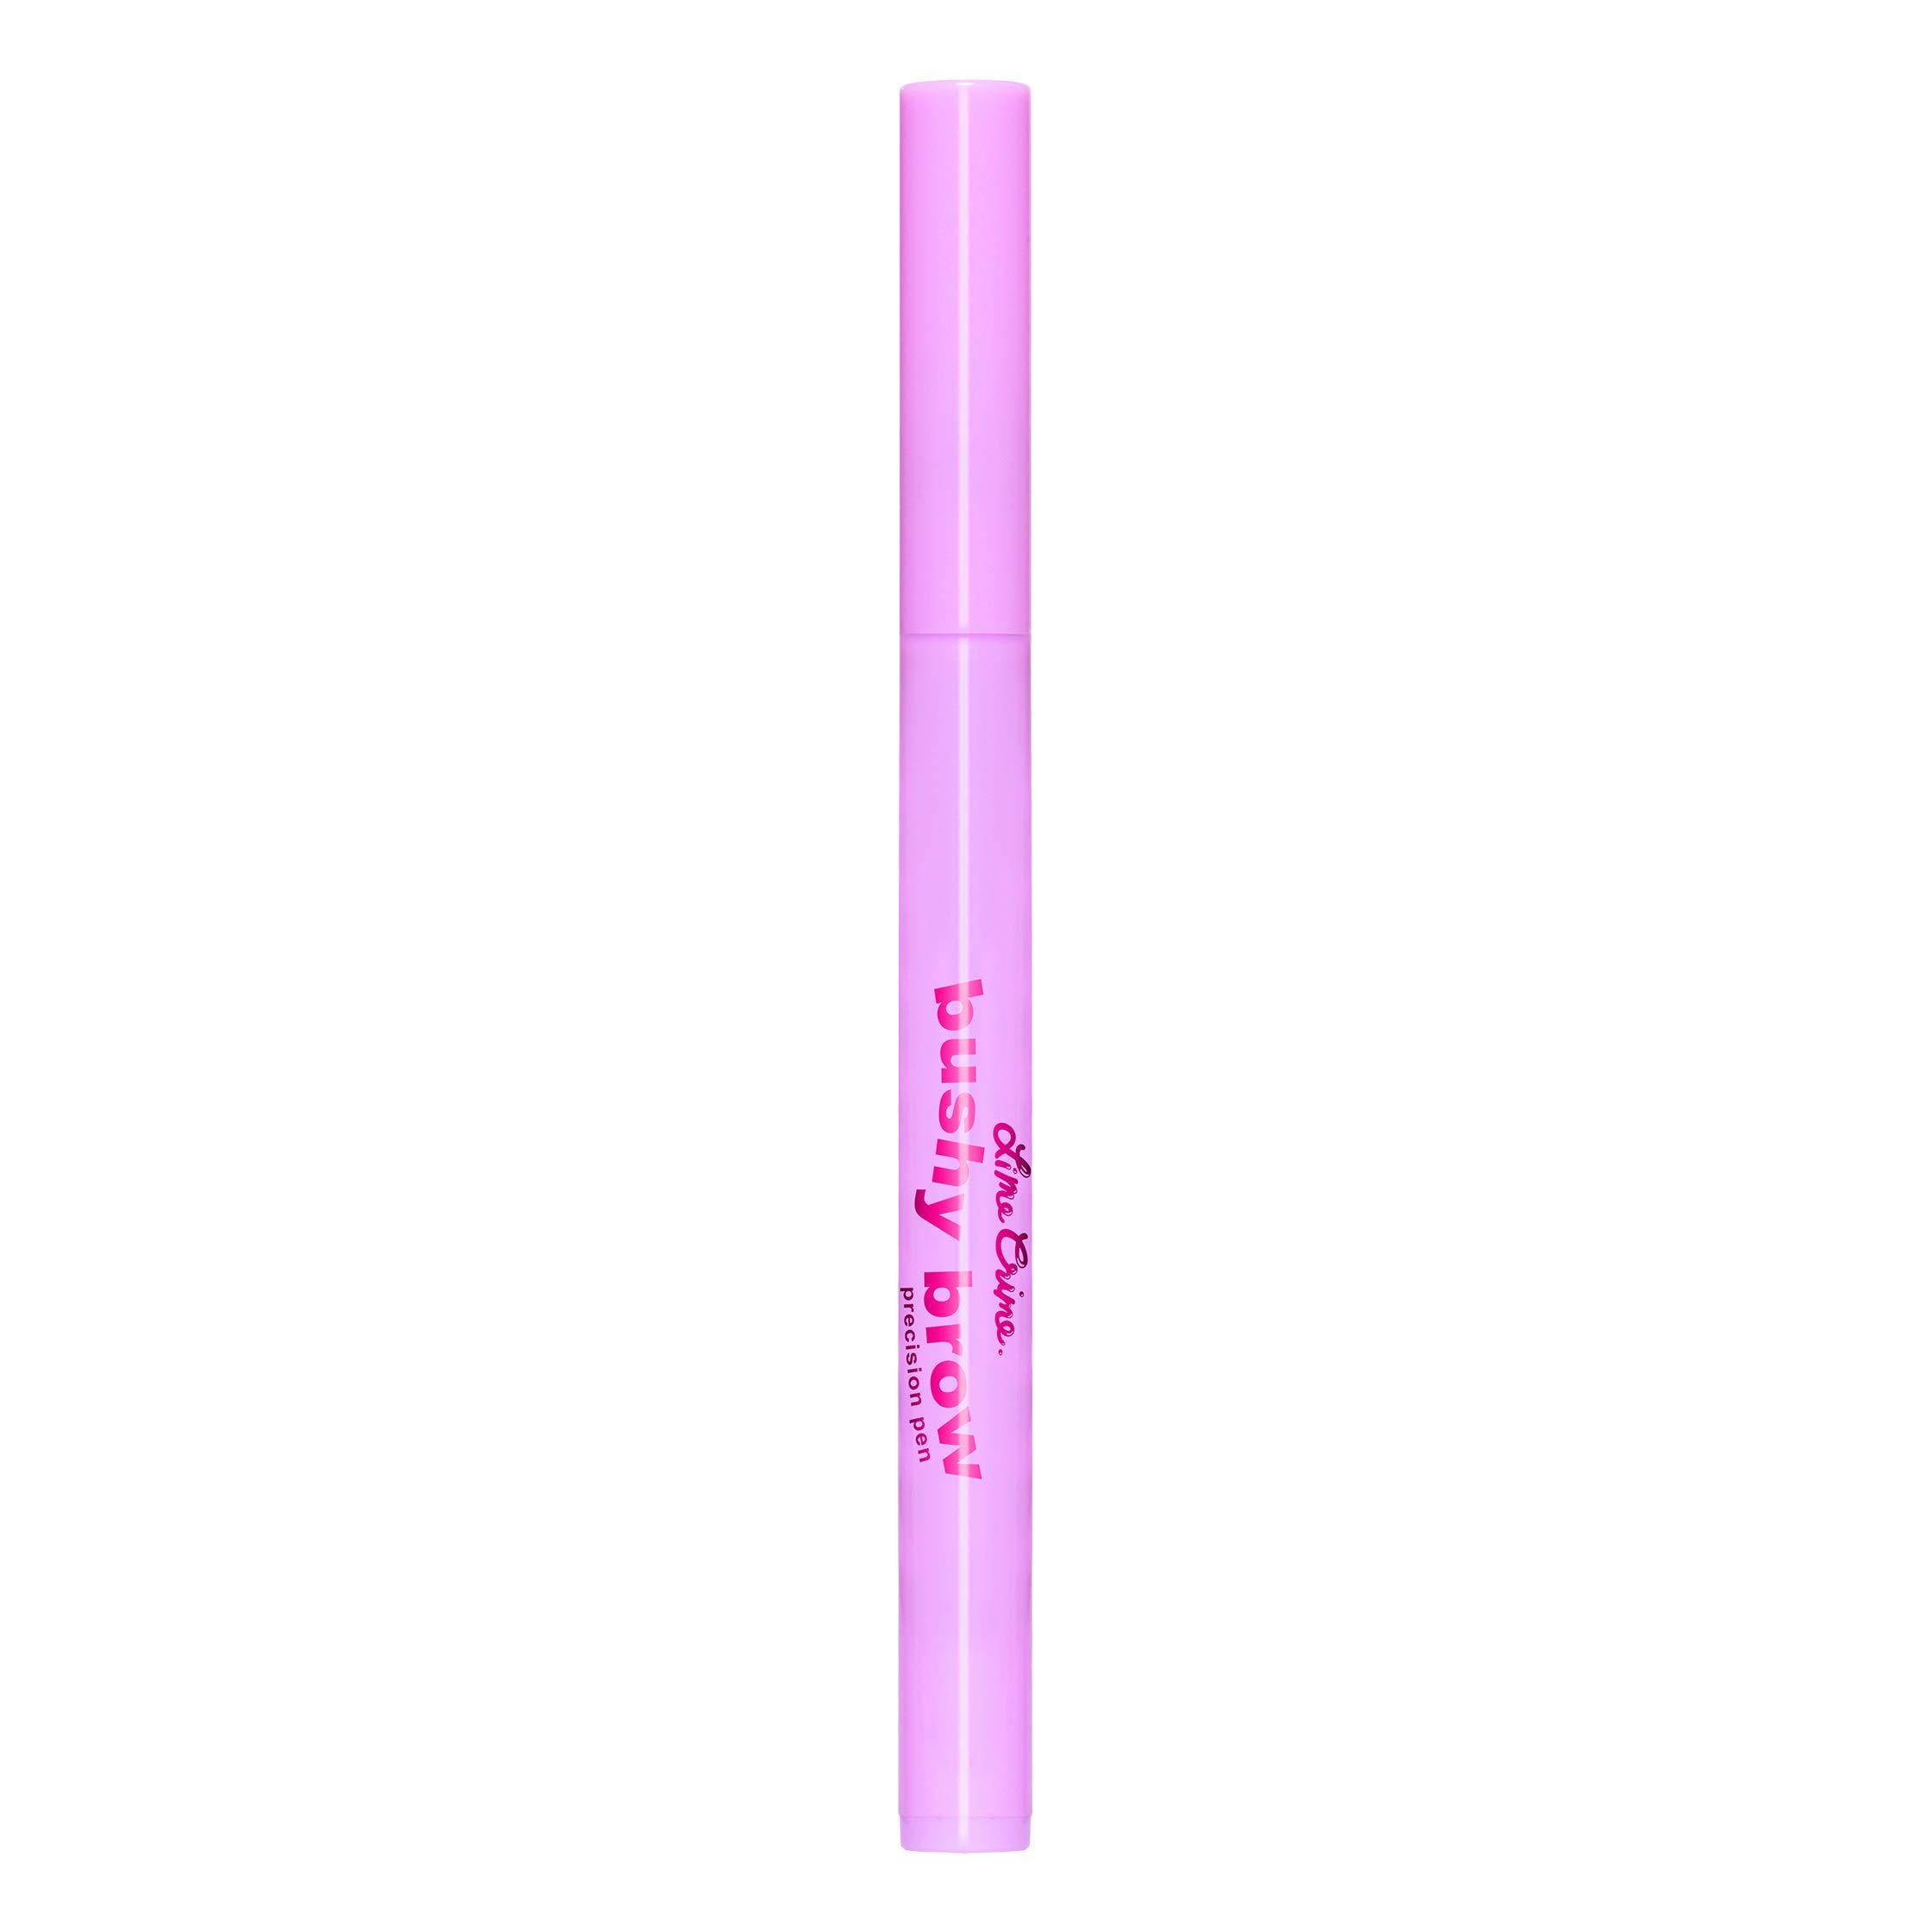 Lime Crime Bushy Brow Precision Pen (Brownie). Neutral Dark Brown Vegan Eyebrow Definer and Filler (0.0236oz / 0.7 mL)